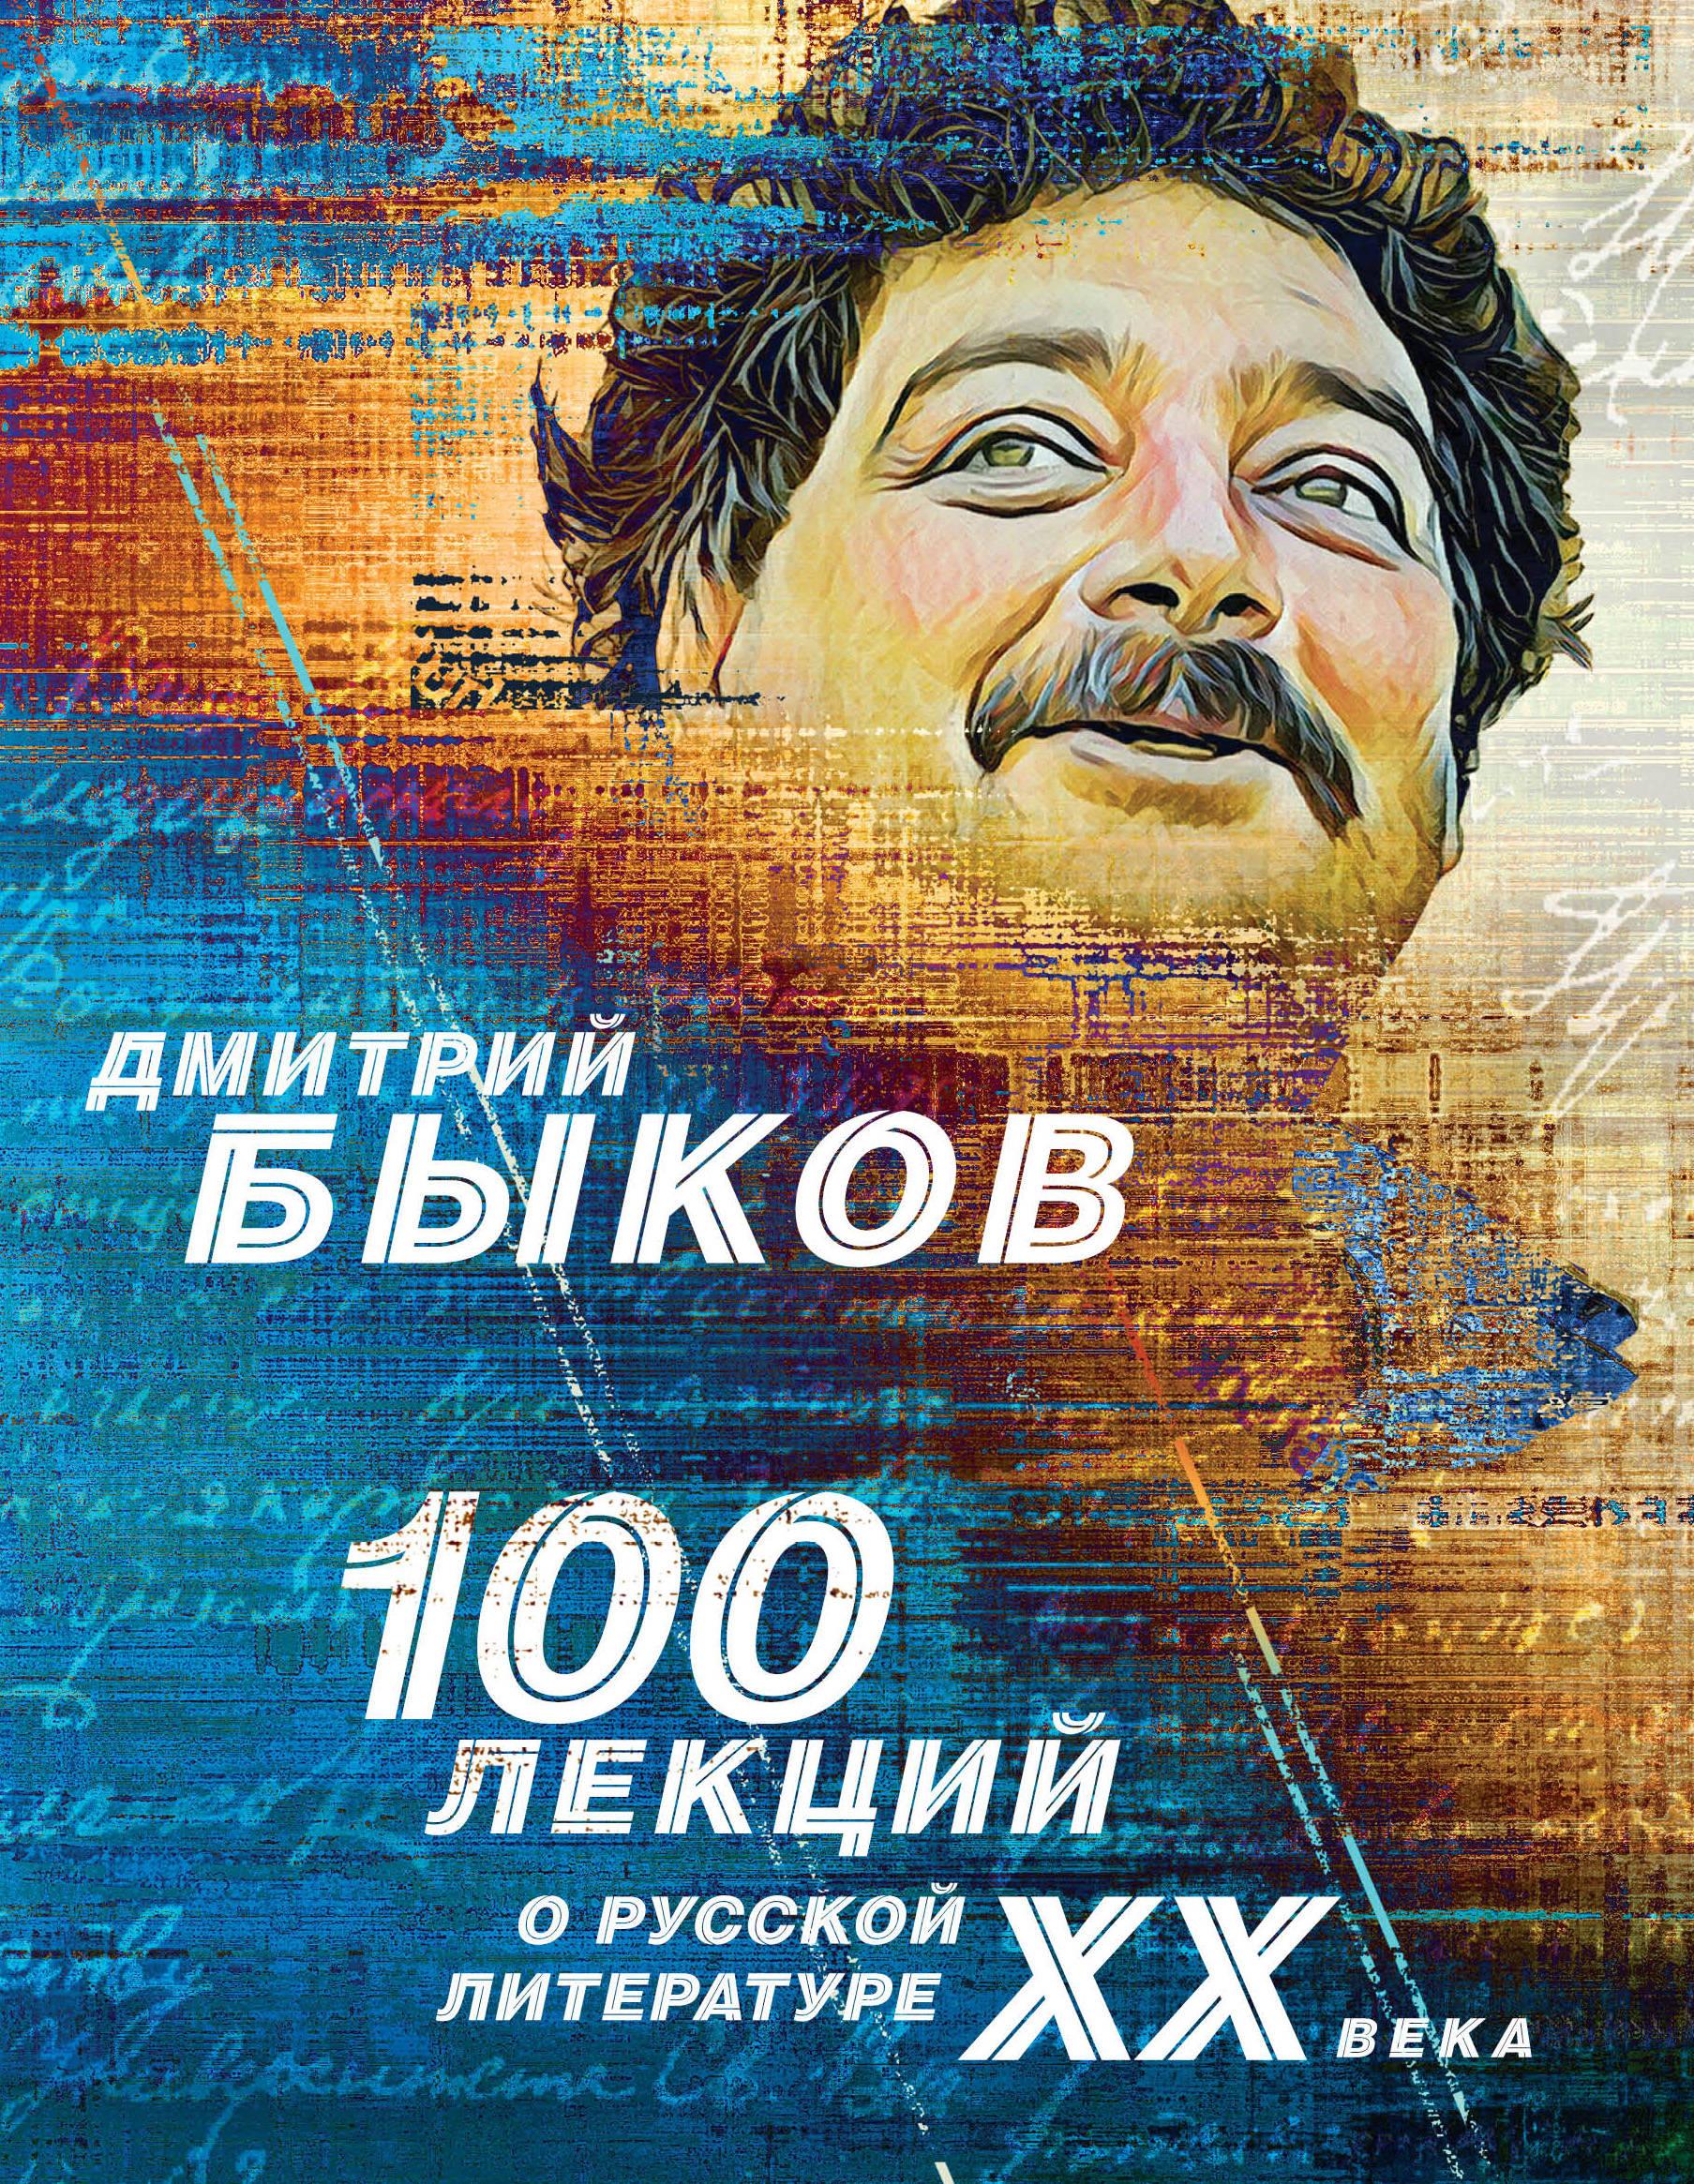 100 lektsij o russkoj literature XX veka